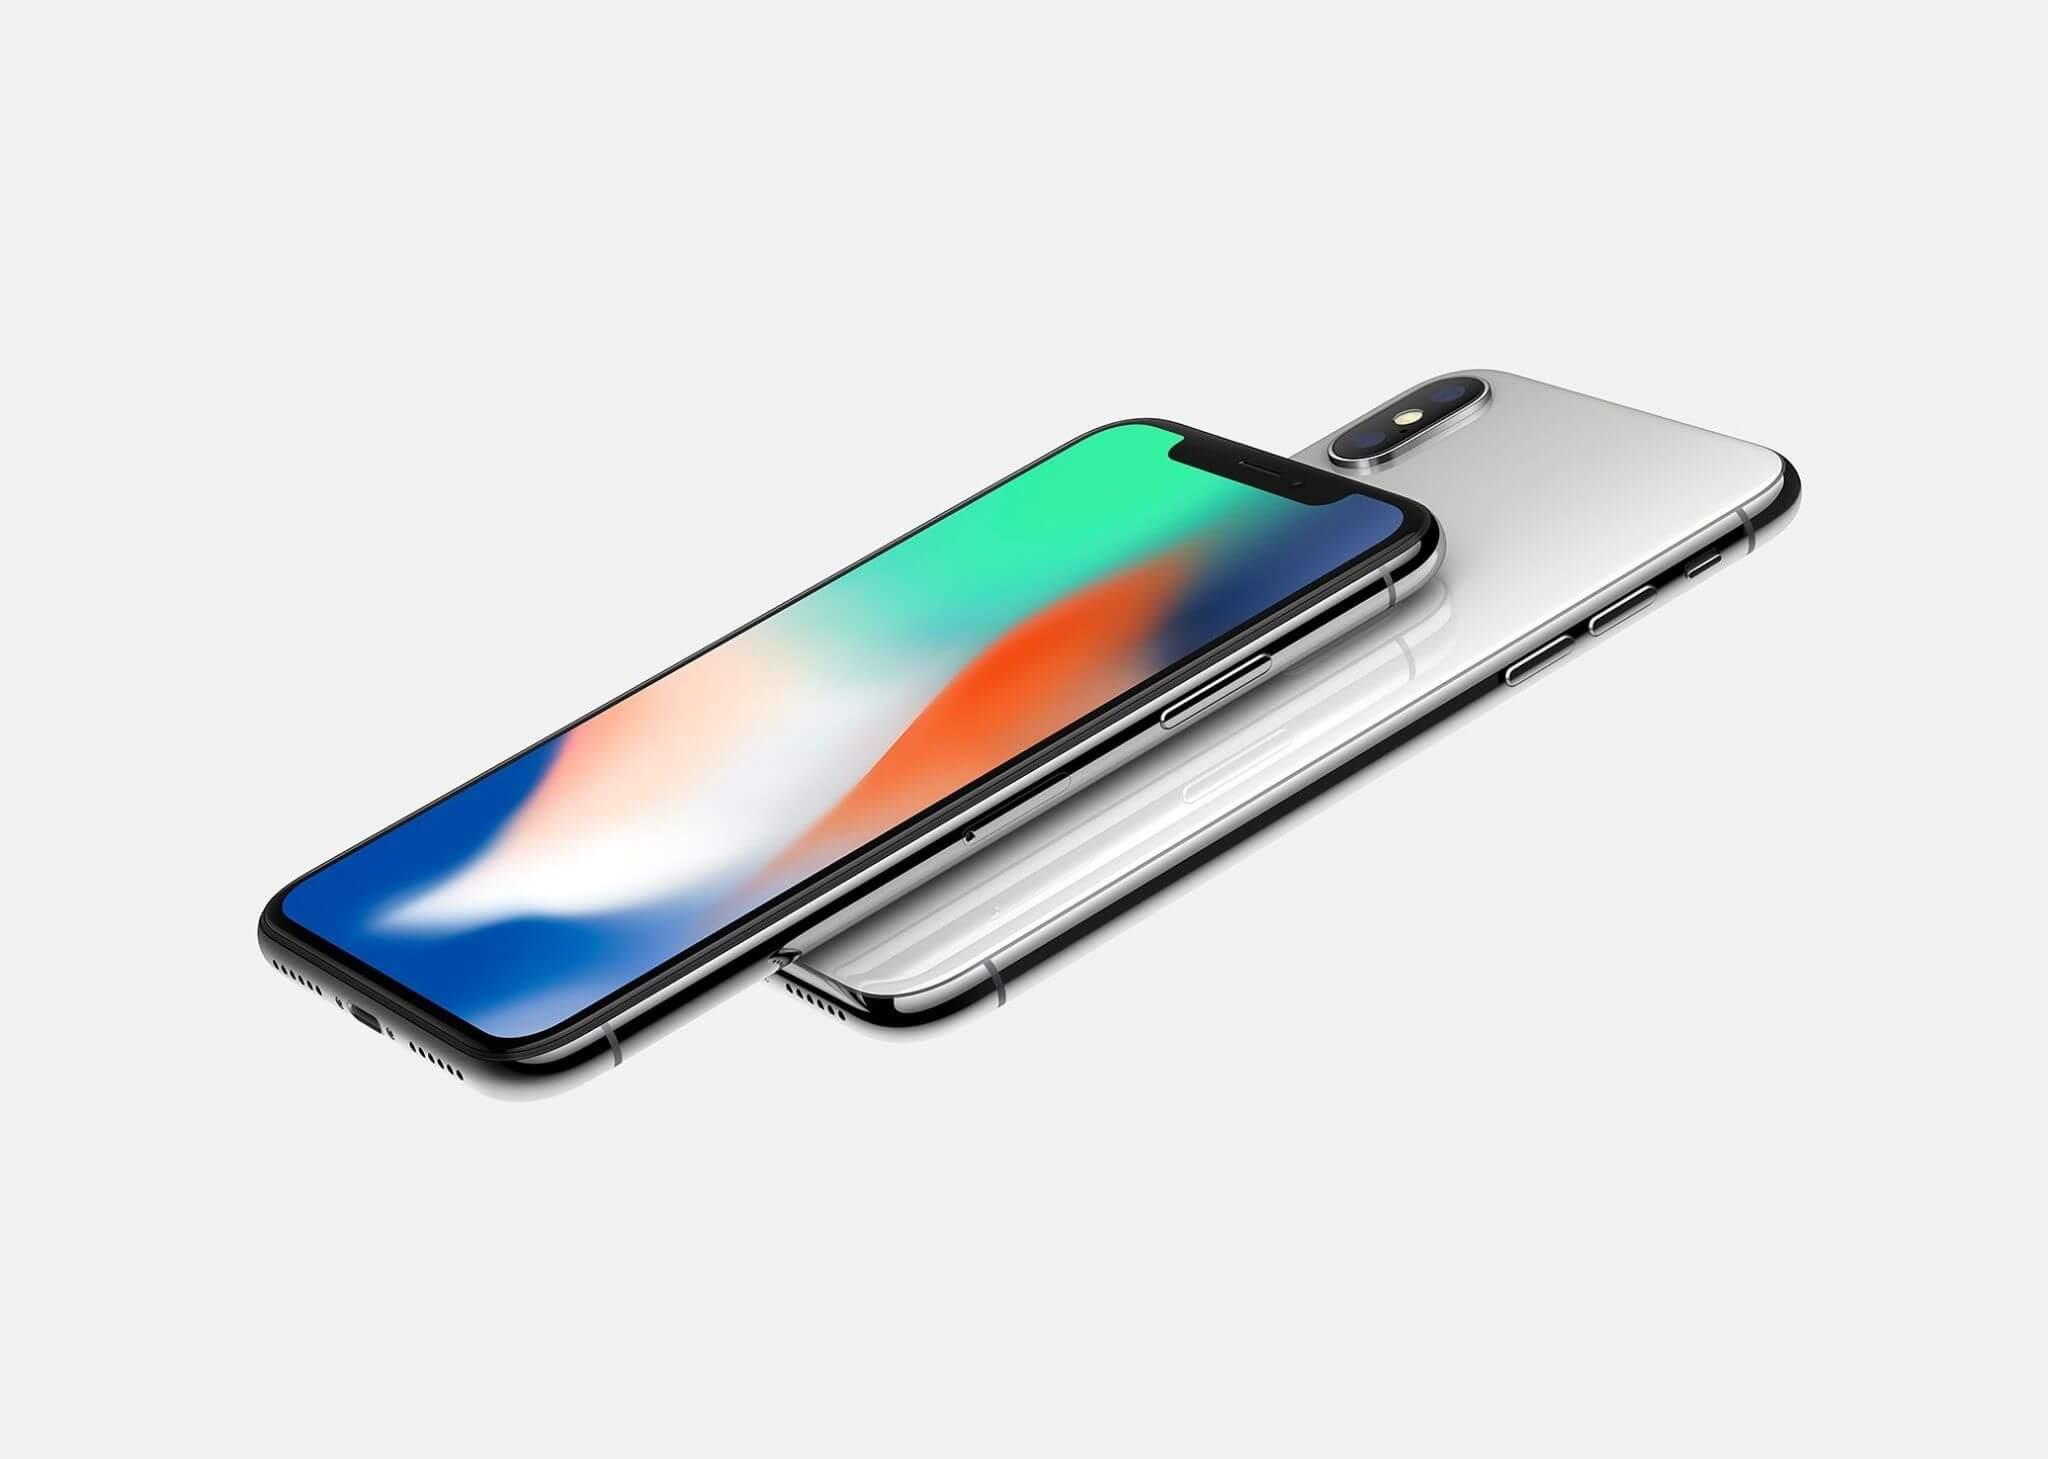 iphone x gallery1 2017.0 - Apple: Watch 3 e iPhone X chegarão ao Brasil ainda neste ano